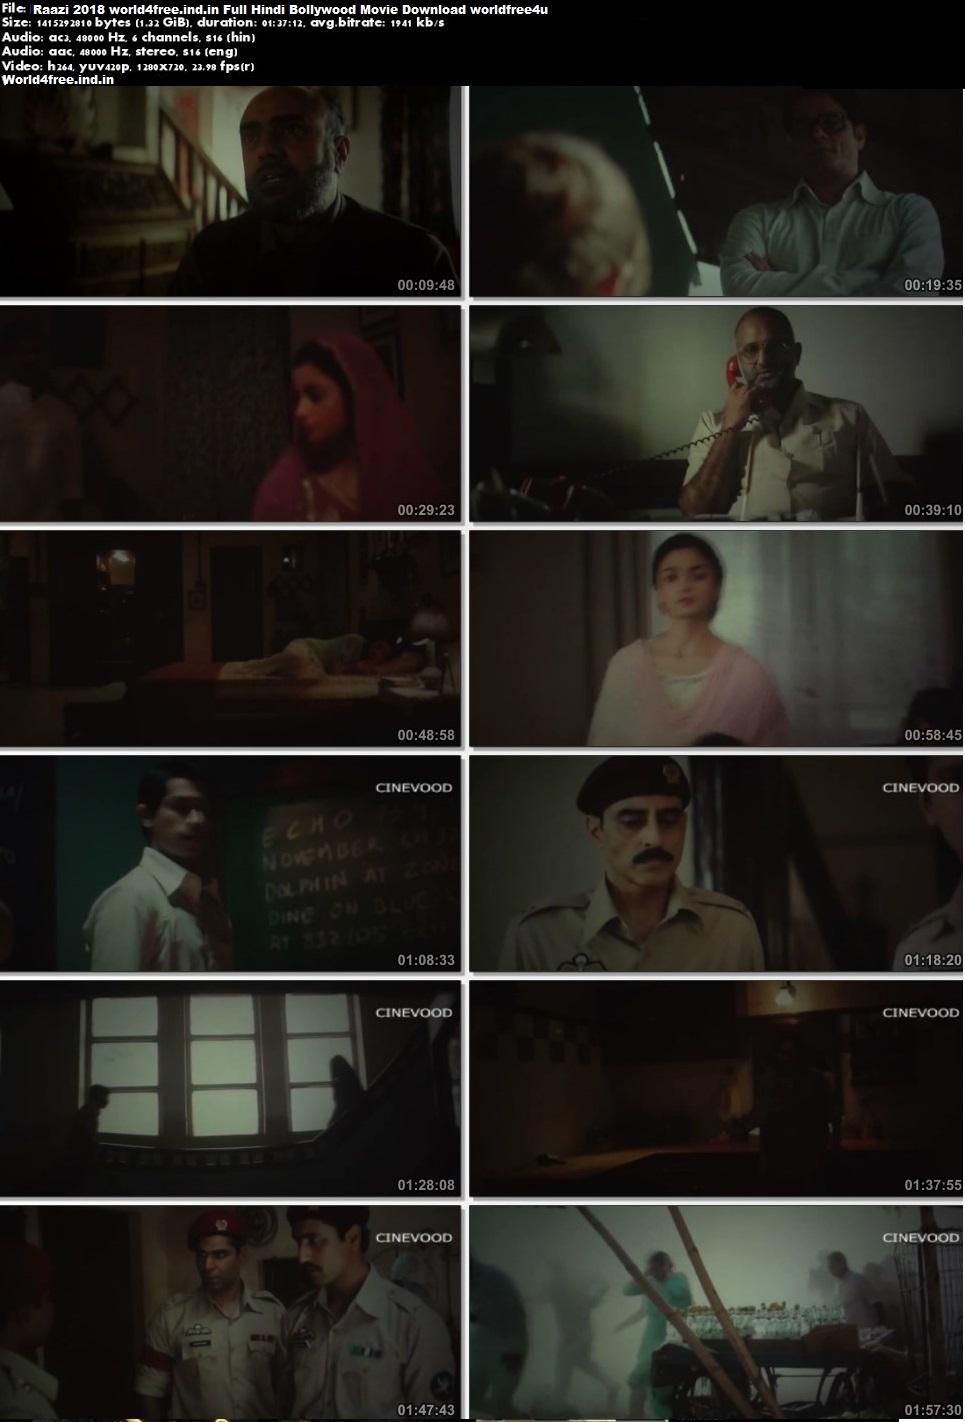 Screen Shoot of Raazi 2018 Full Hindi Movie Download In pDVDRip 700Mb